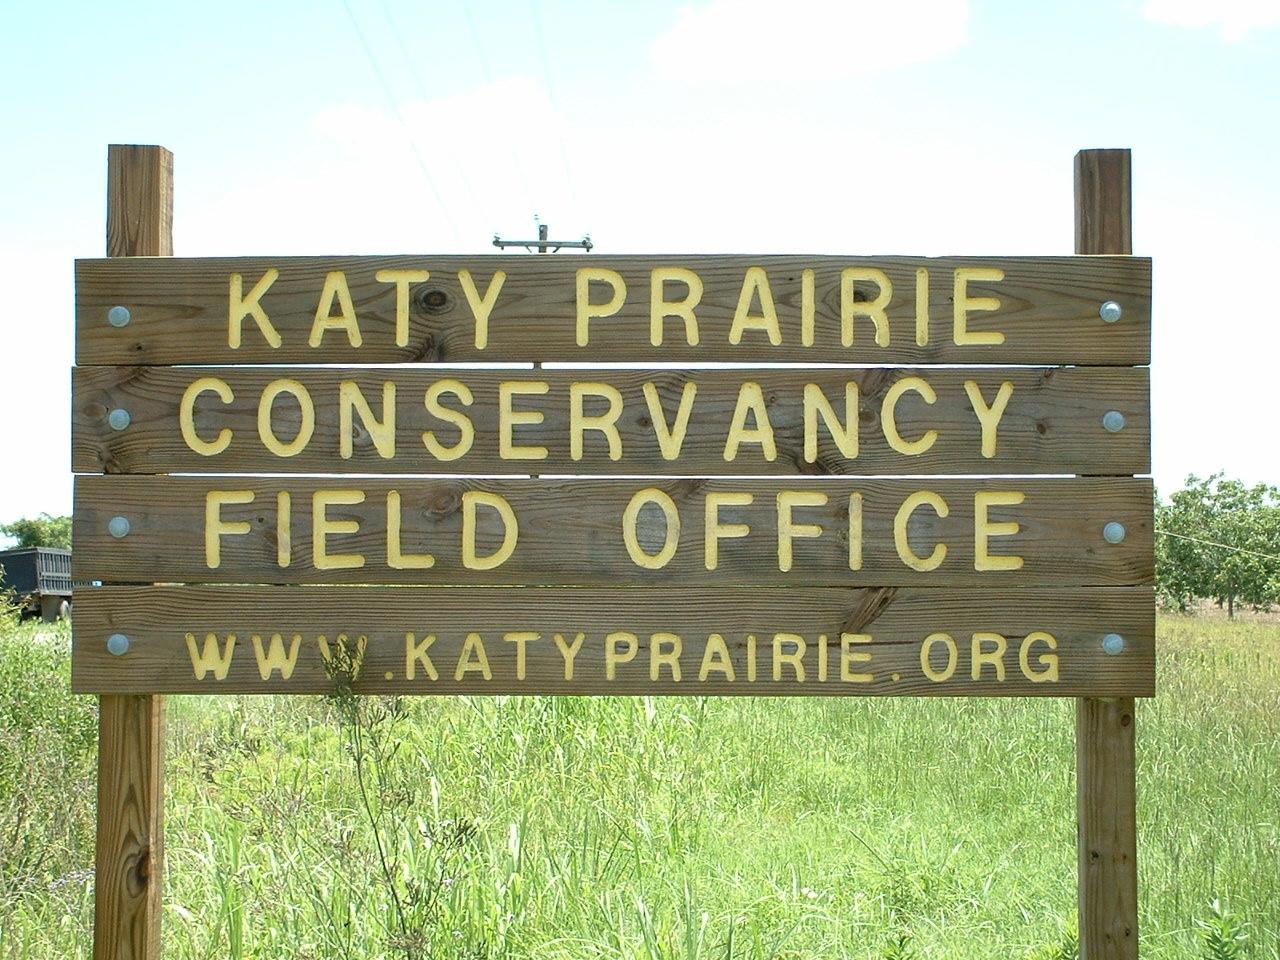 060715-035-KPC field office sign.JPG